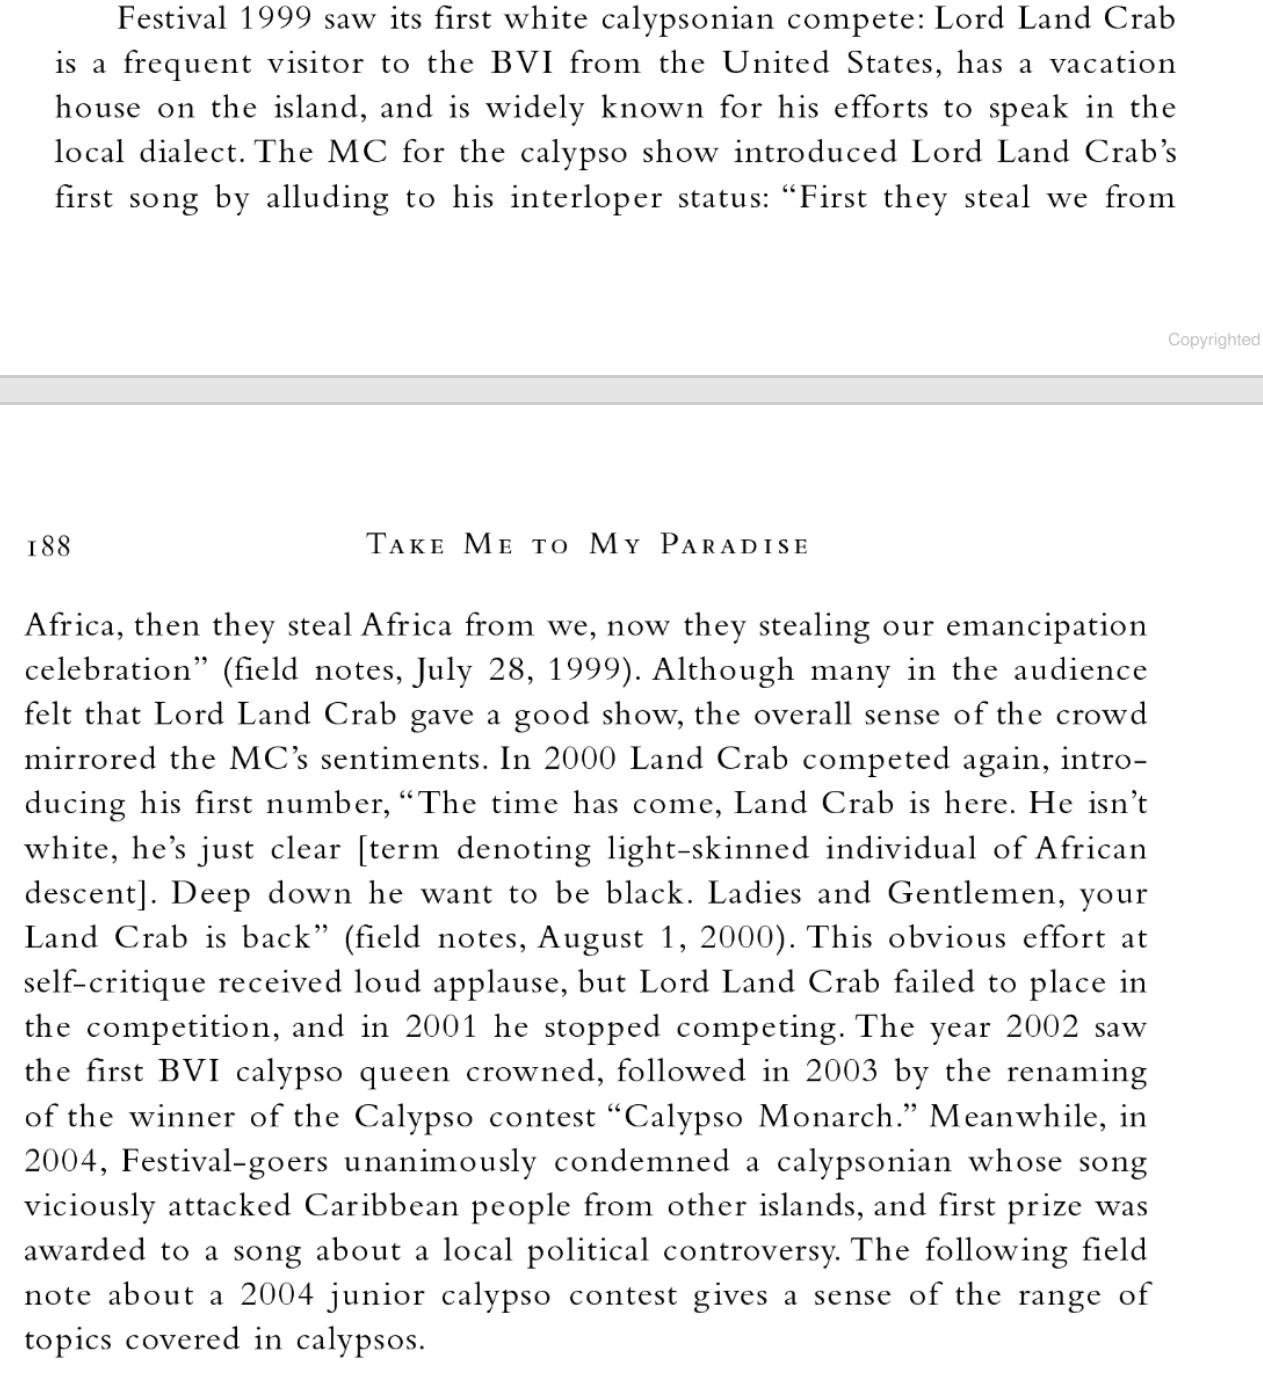 Description of first white Calypso performer at Festival